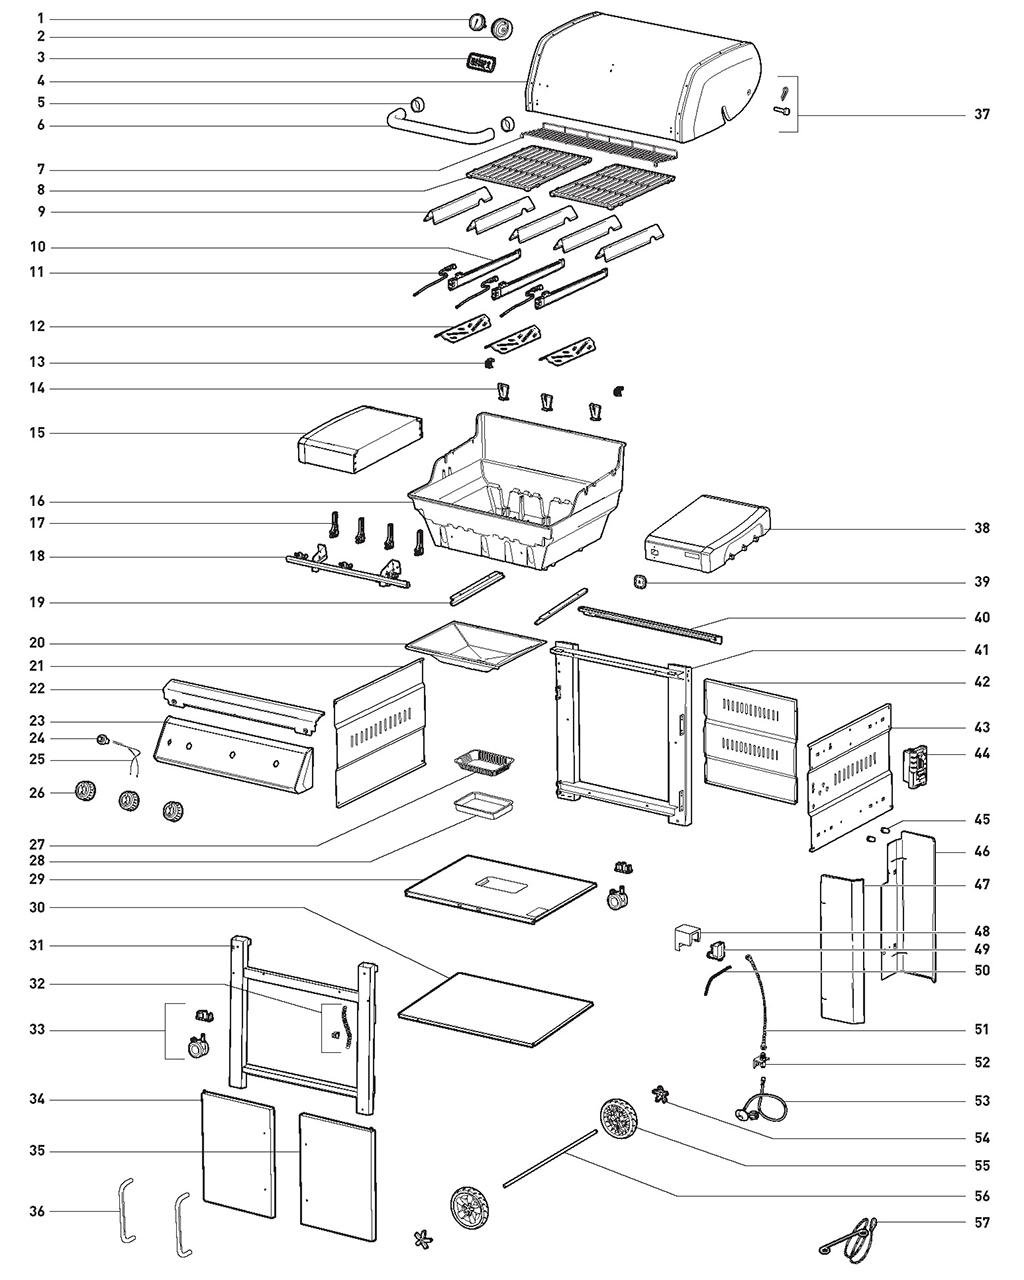 Schematic Image 61015001